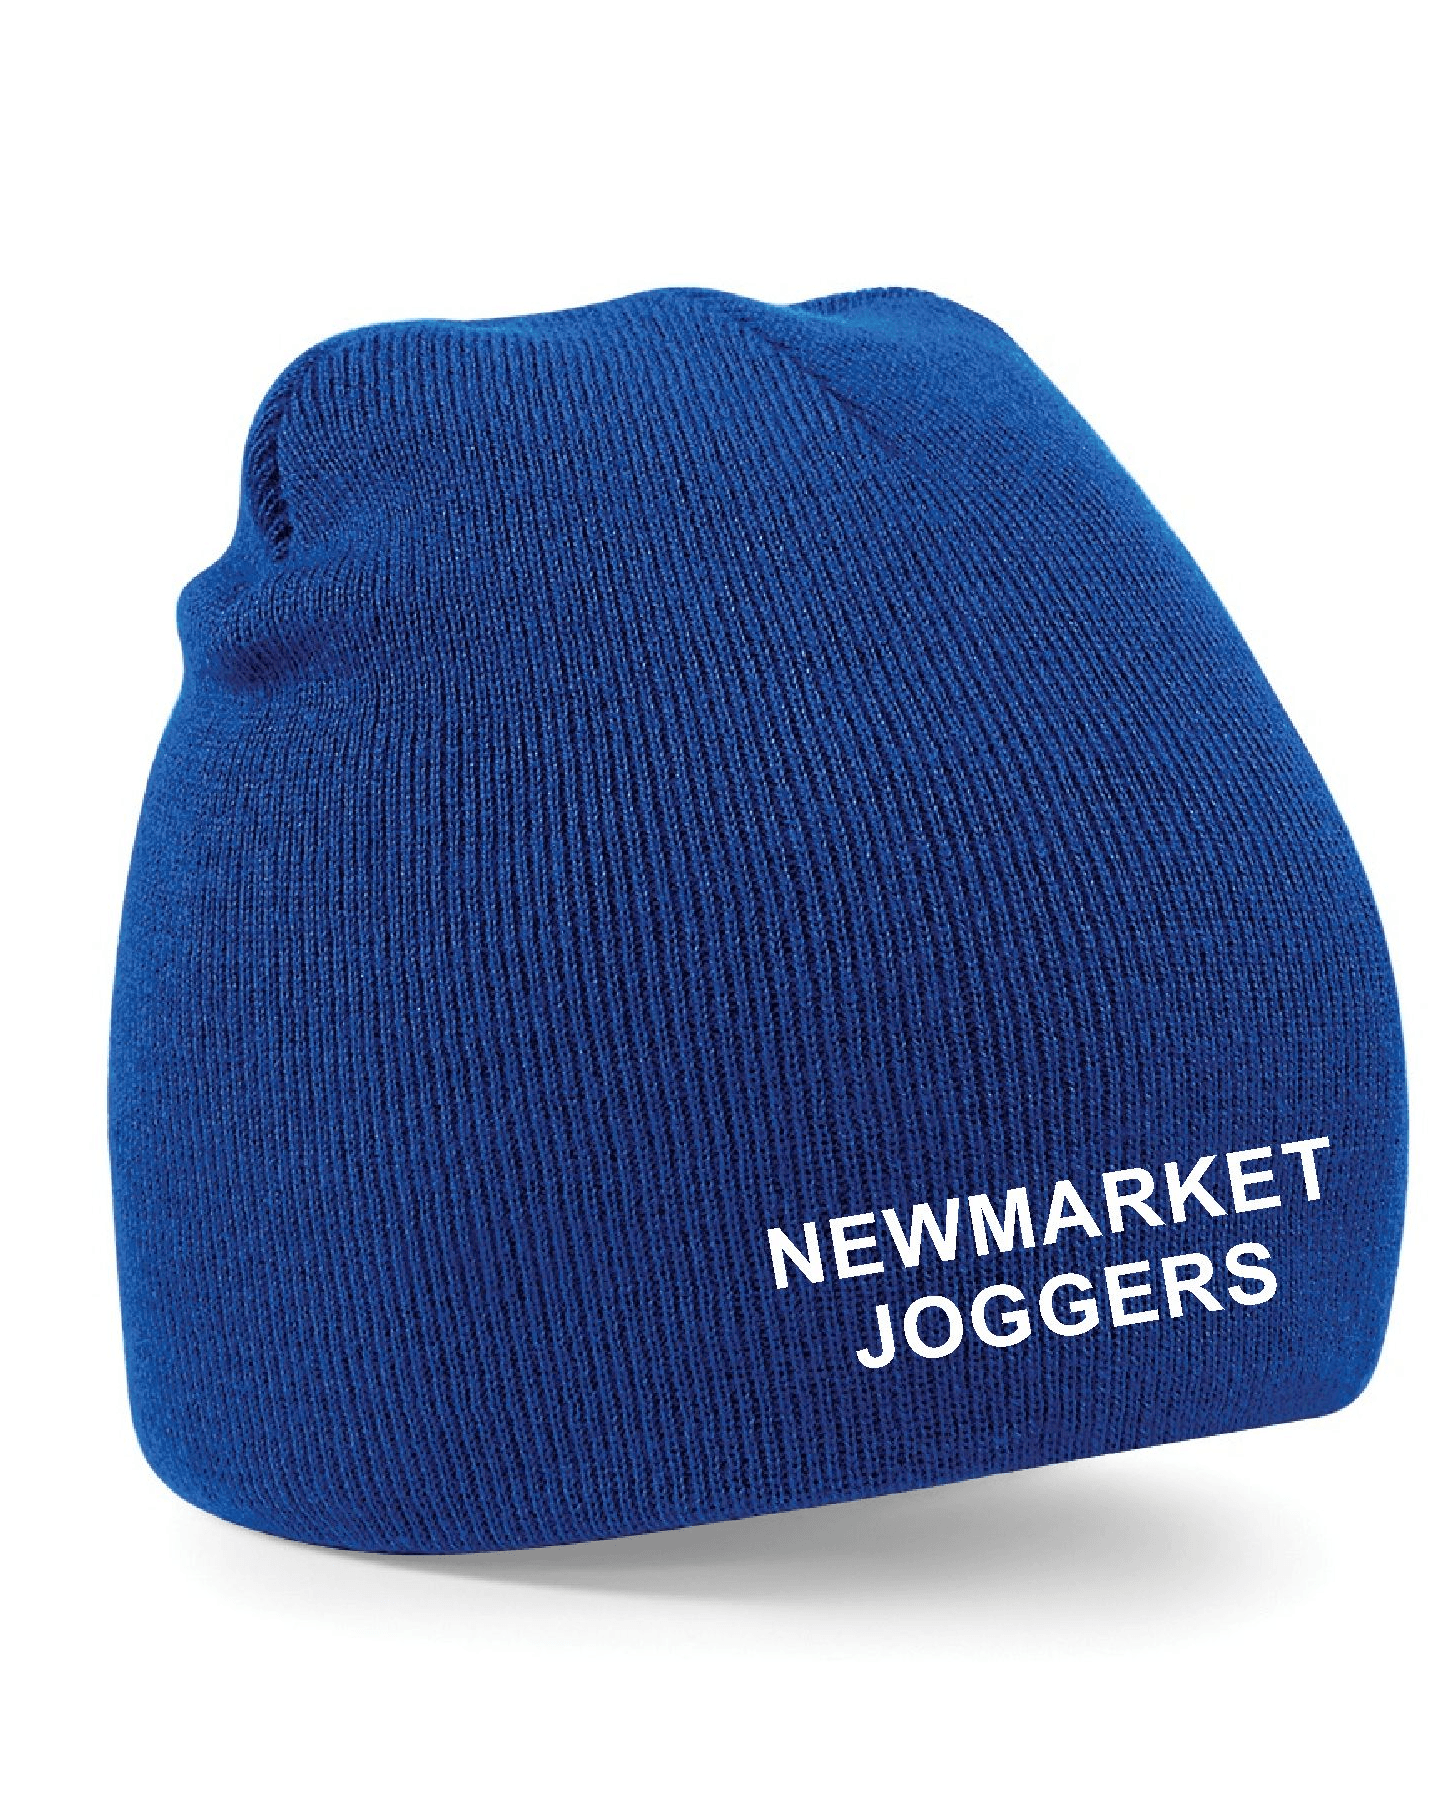 Newmarket Joggers – Beanie (Unisex)